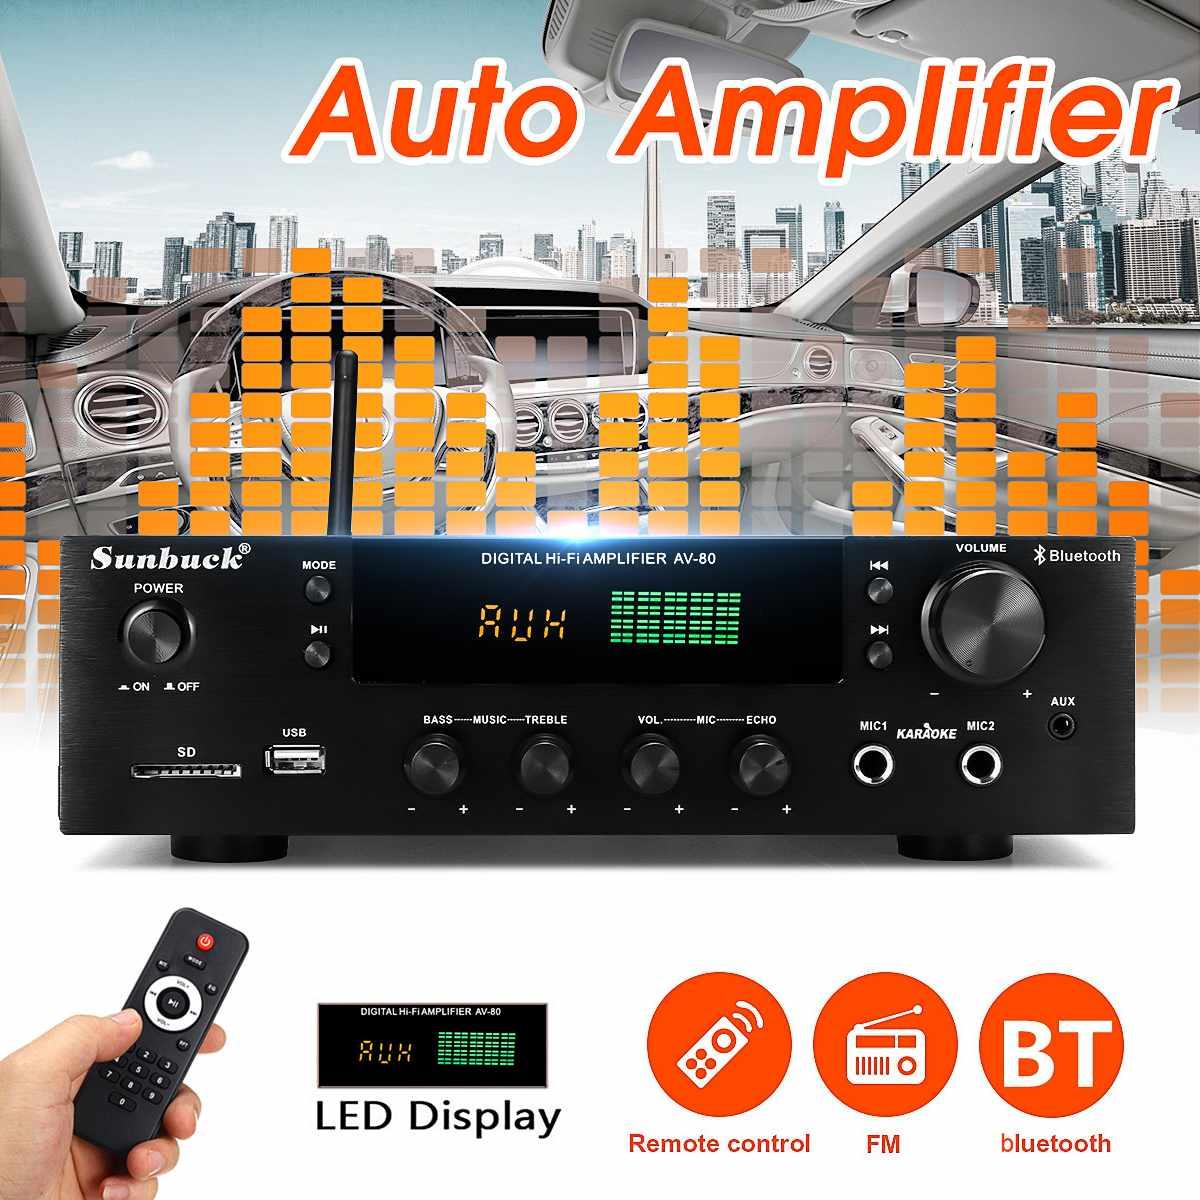 Amplificador de Potência Teli Alta Fidelidade Tecnologia Automática Bluetooth Estéreo Áudio Karaoke fm Receptor Usb sd Placa Amplifer Bt-1388